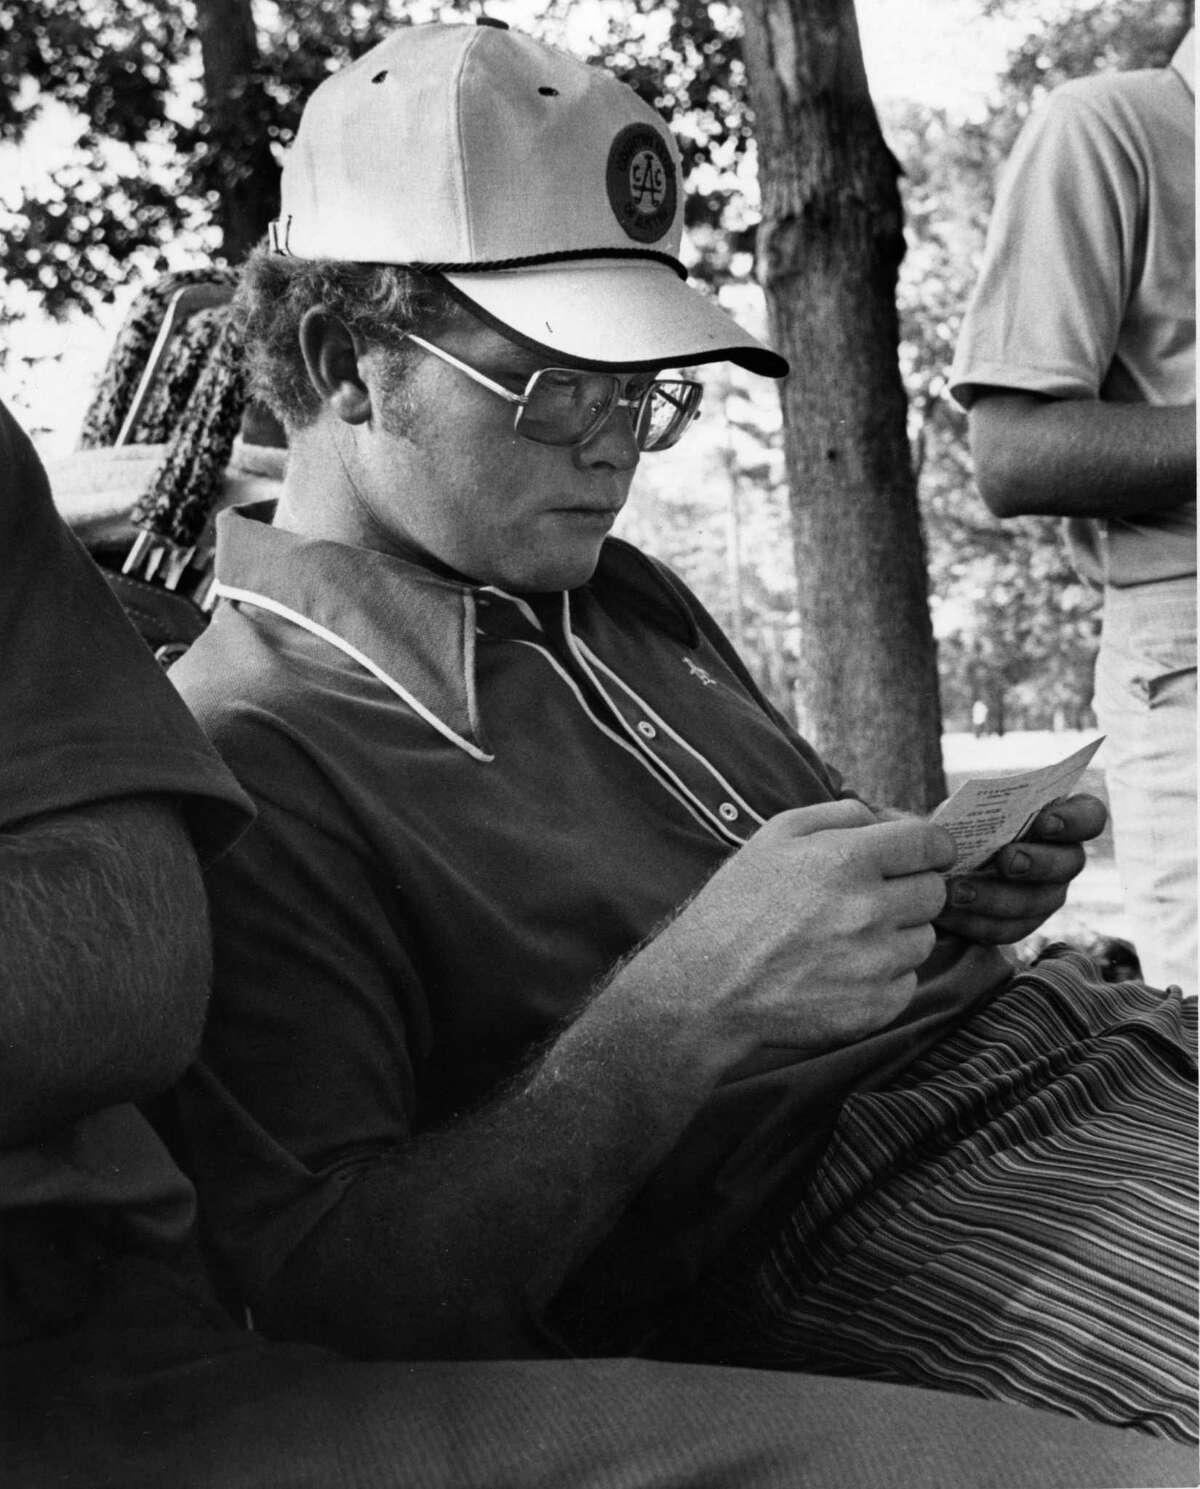 05/1974 Houston Open Golf - Quail Valley Golf Club. Tom Kite checks his scorecard.